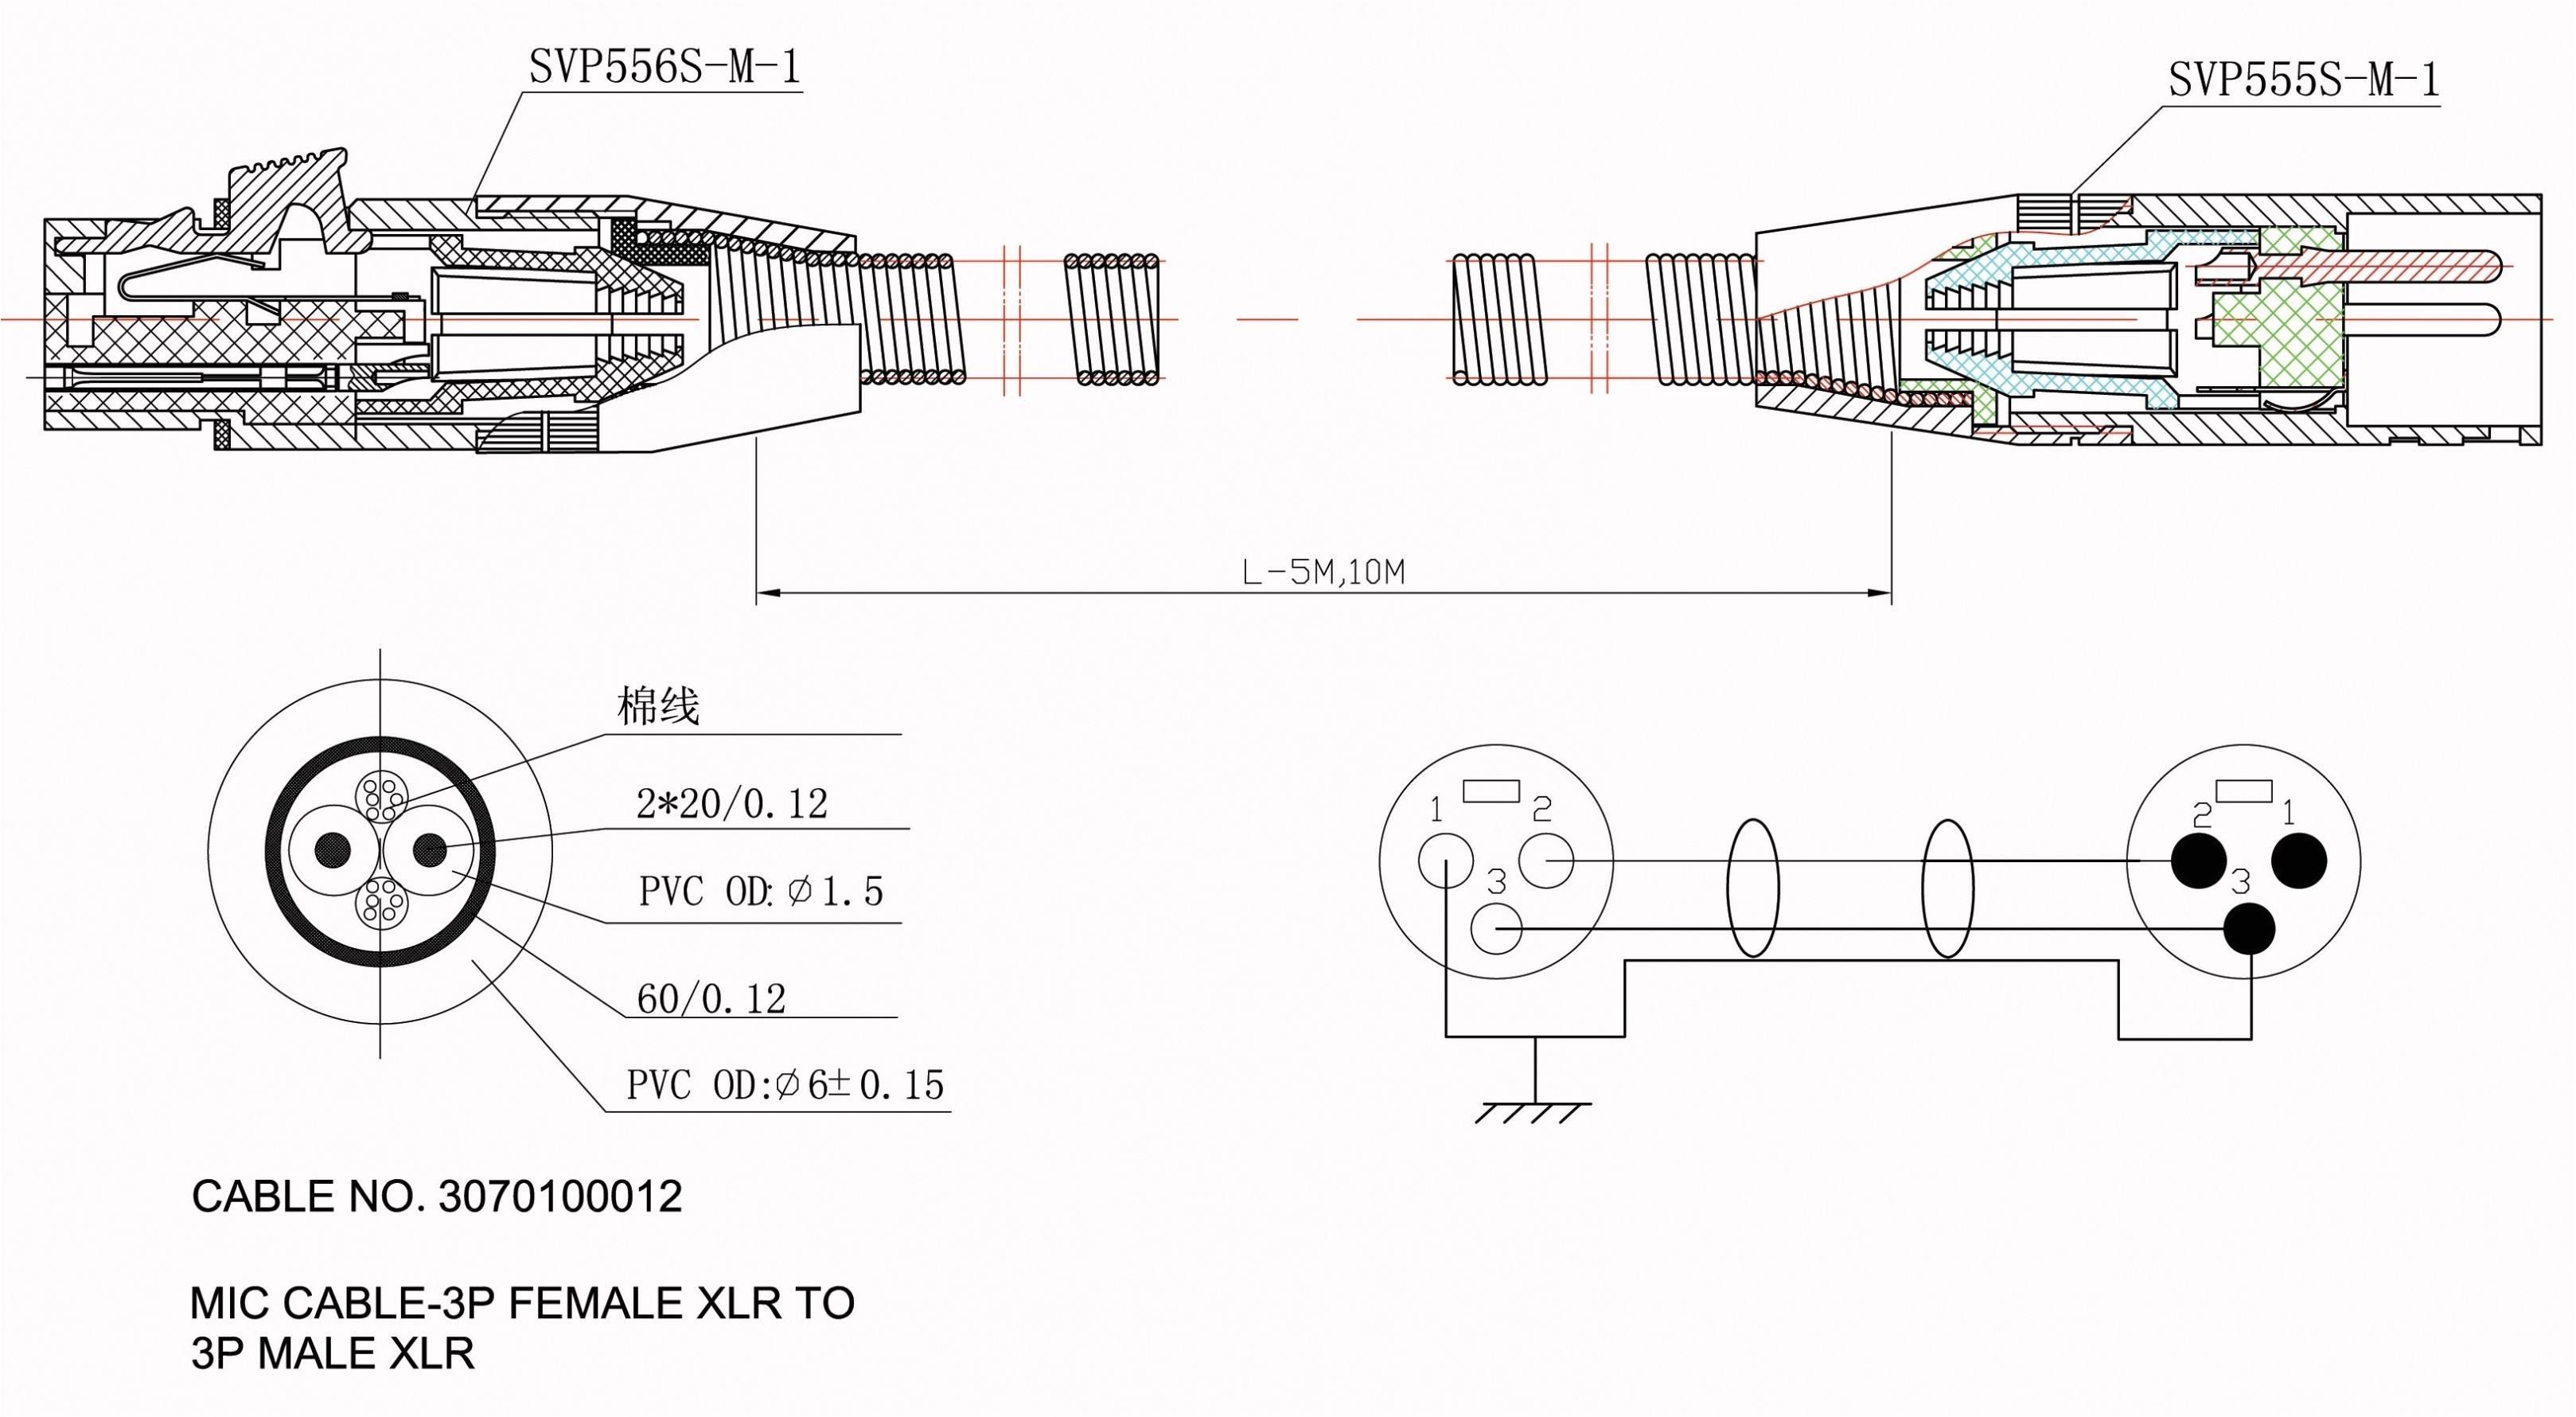 chevy silverado tail light wiring diagram zookastar types of 2005 chevy silverado tail lights